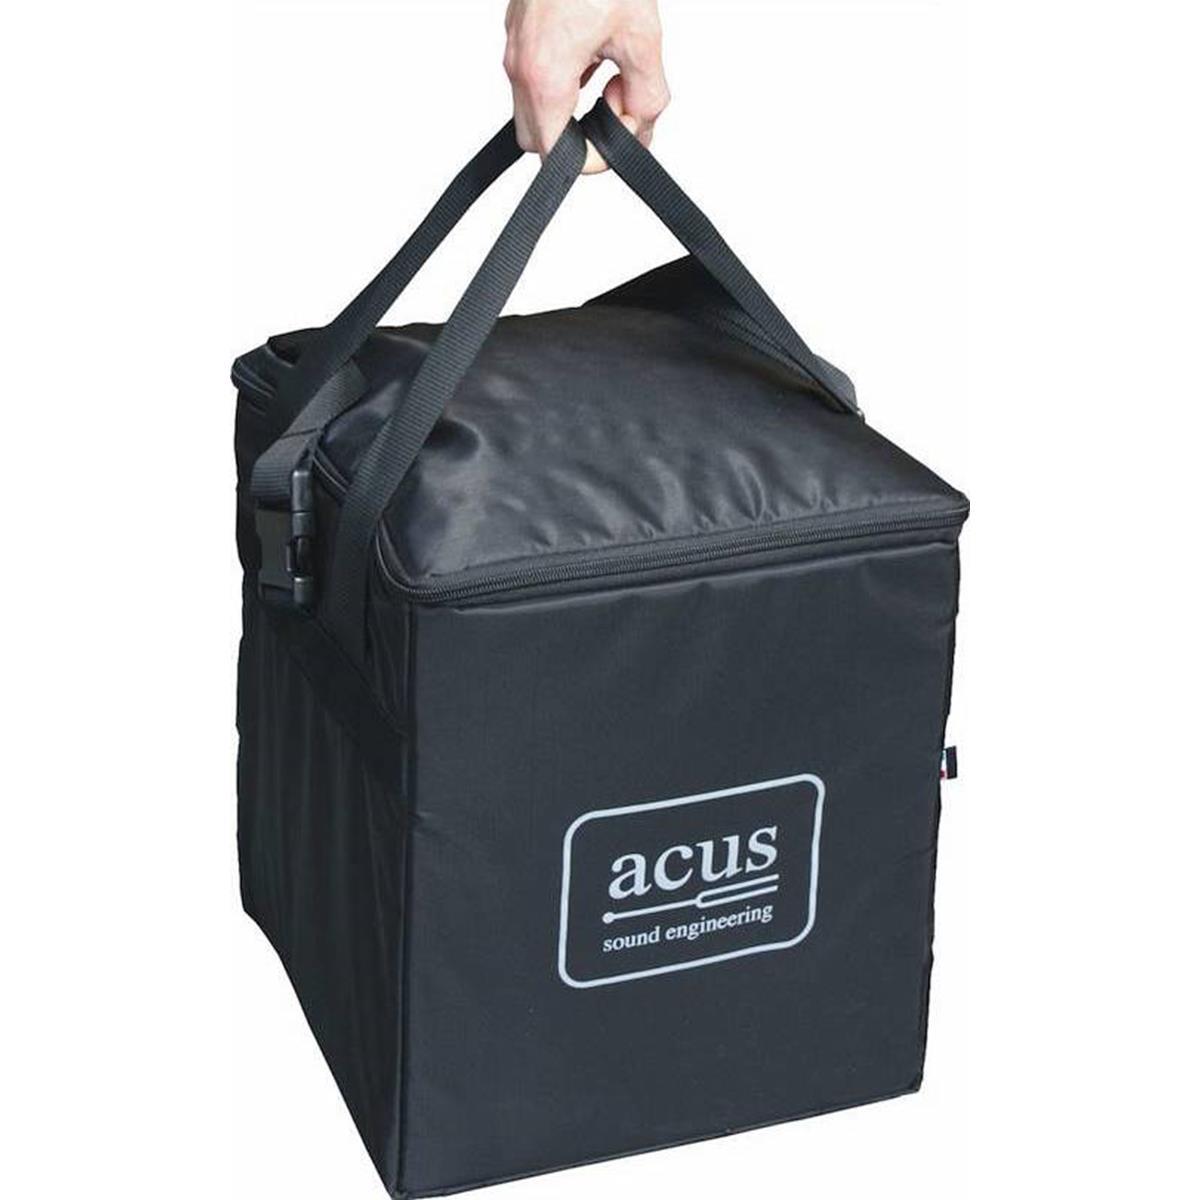 ACUS-BAG-S5-CUSTODIA-MORBIDA-PER-ONEFOR-S5-ONEFORSTRINGS-sku-13215